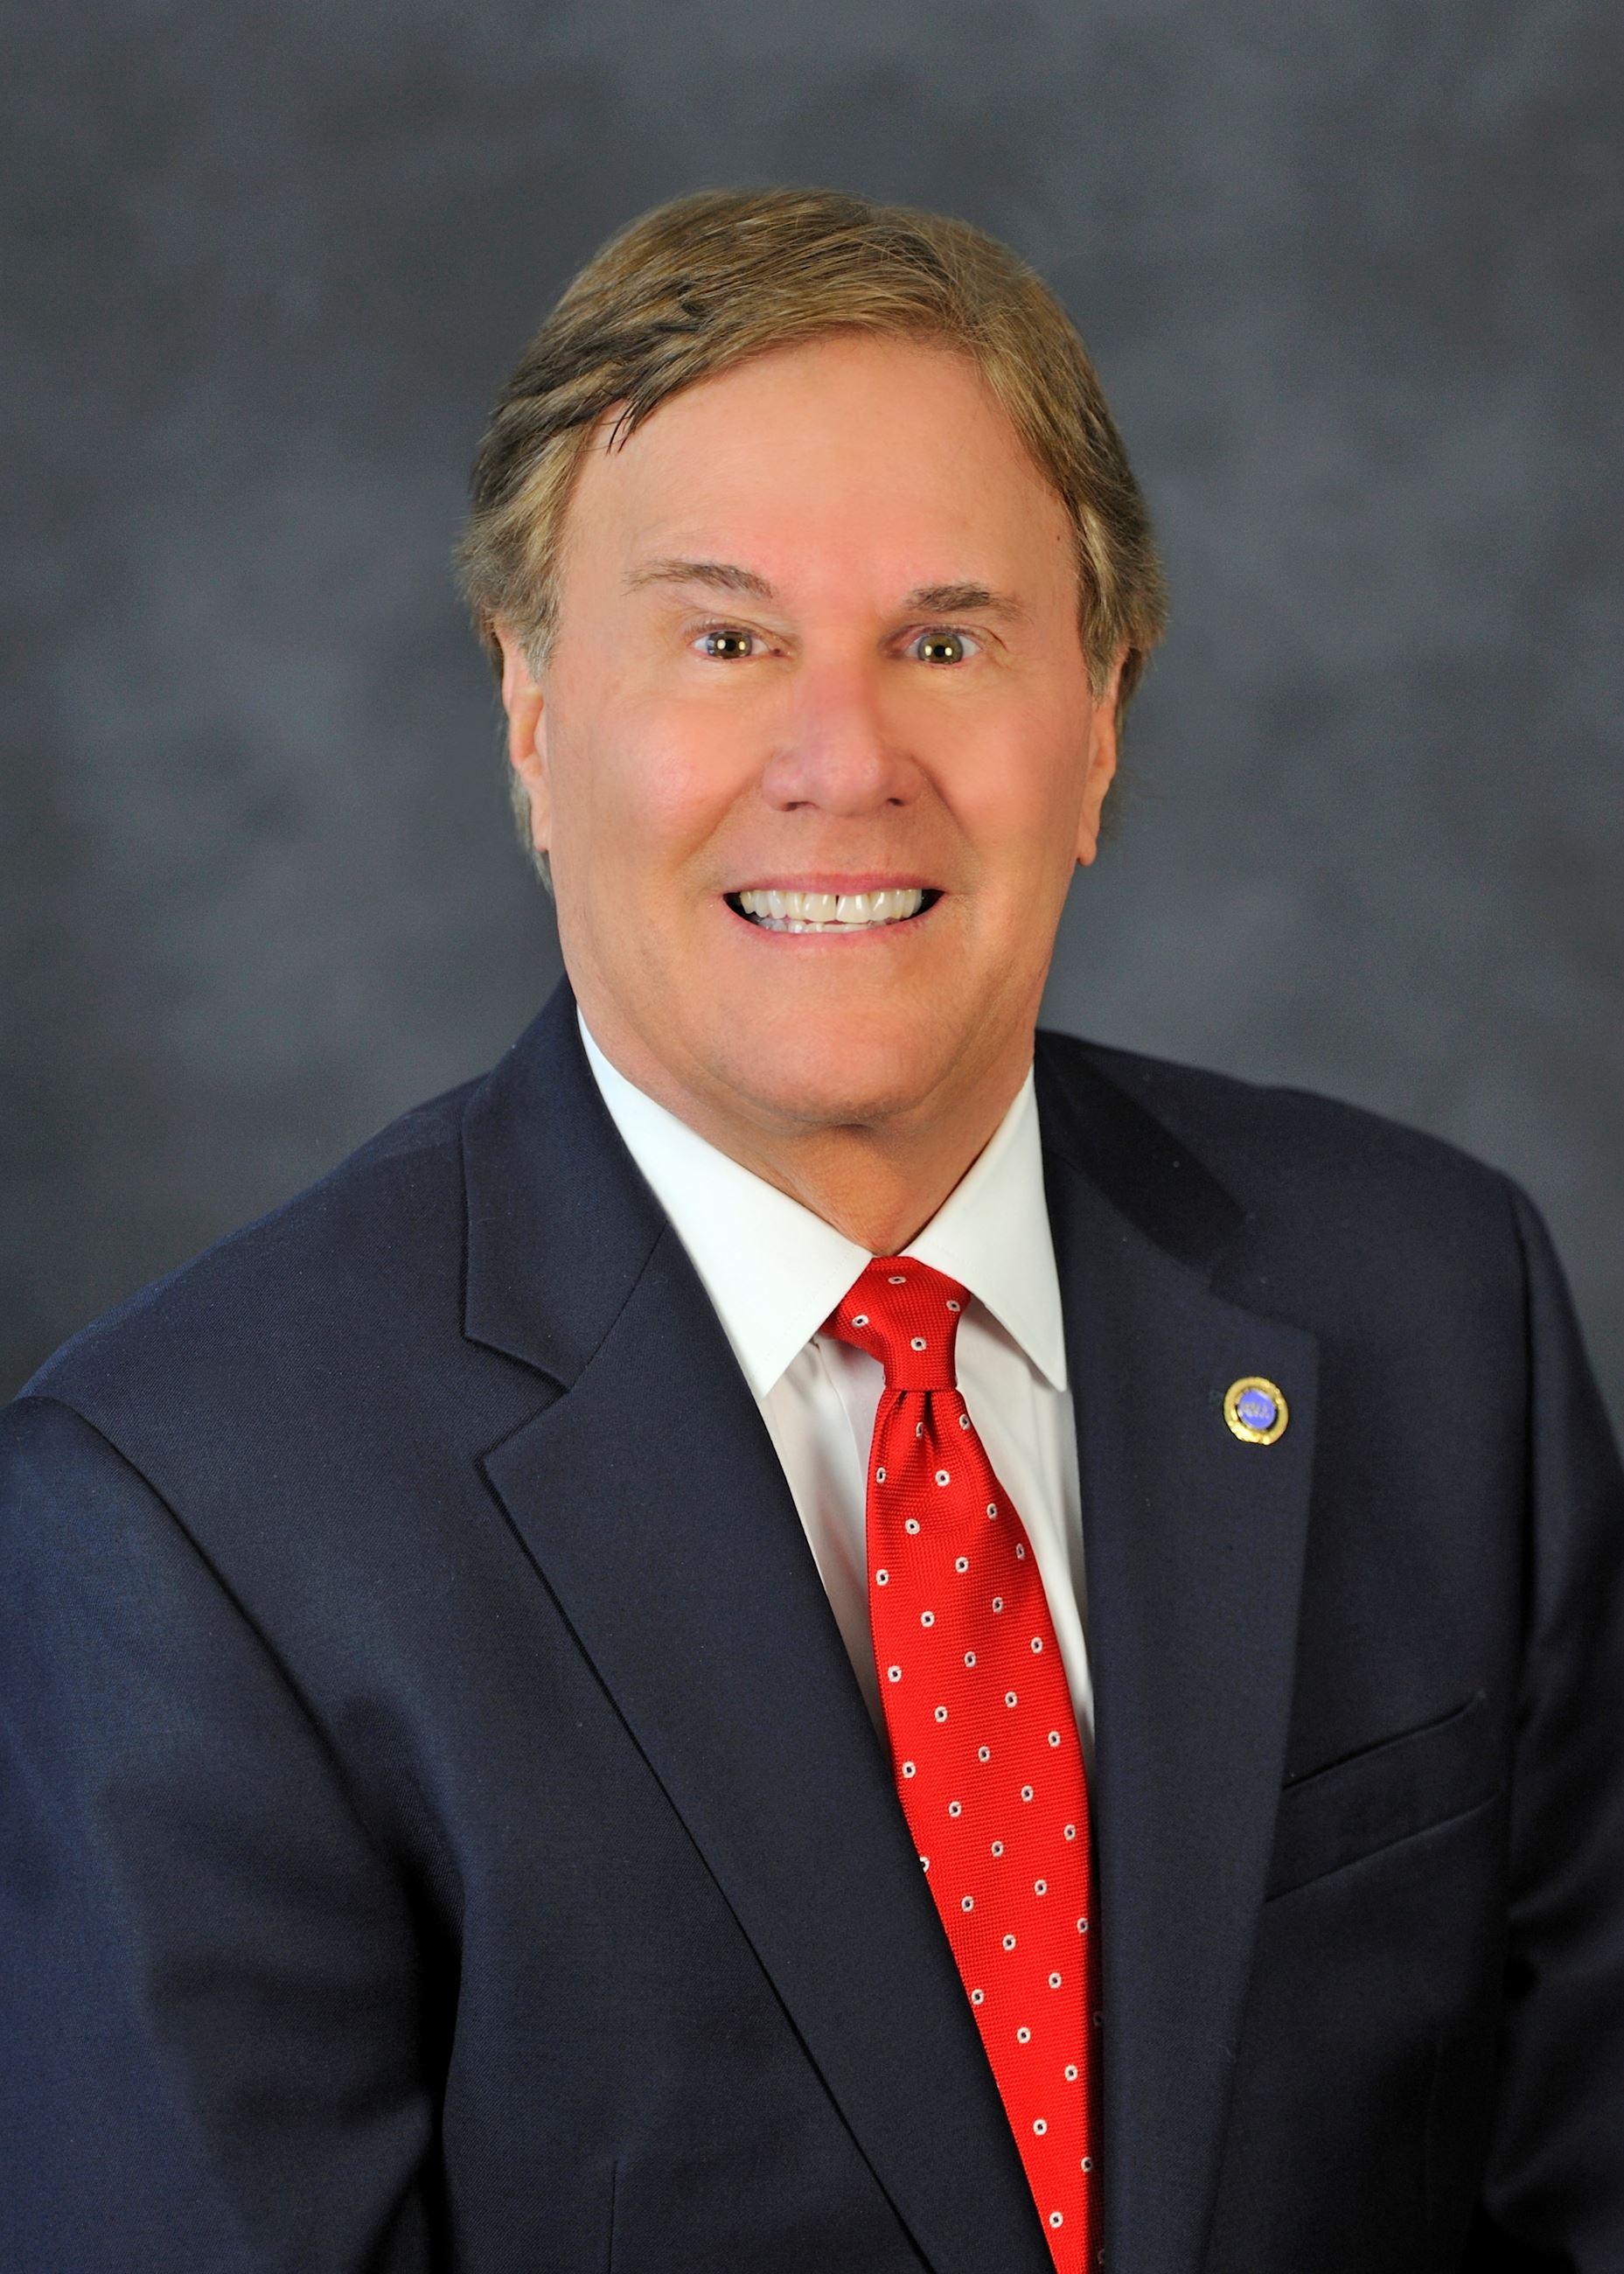 Commissioner Blair J Ciklin